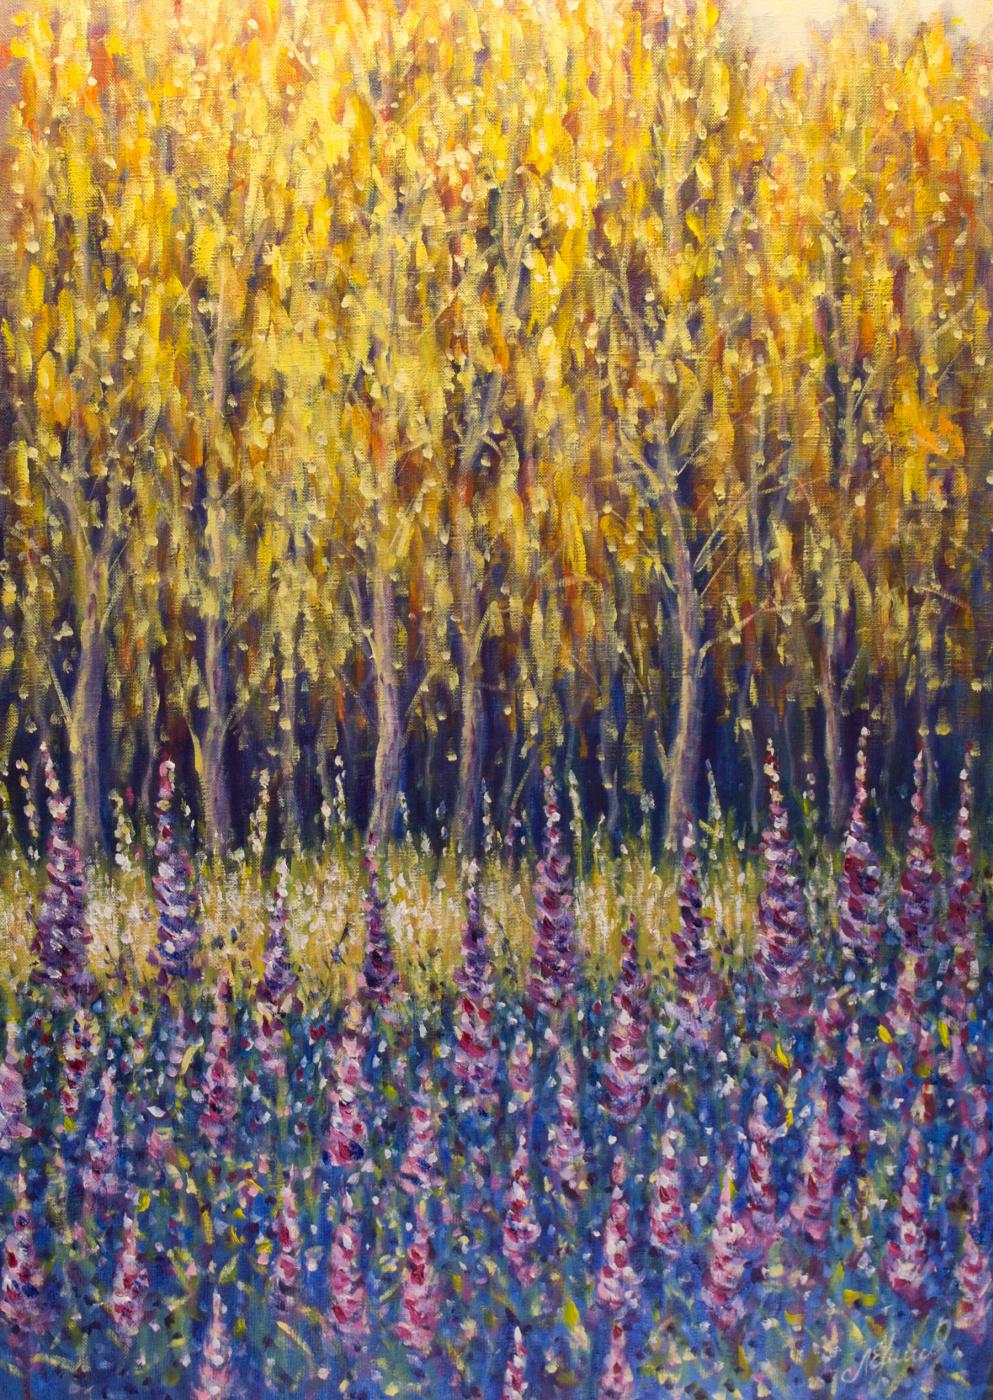 Valery Levchenko. No. 375 Autumn decoration